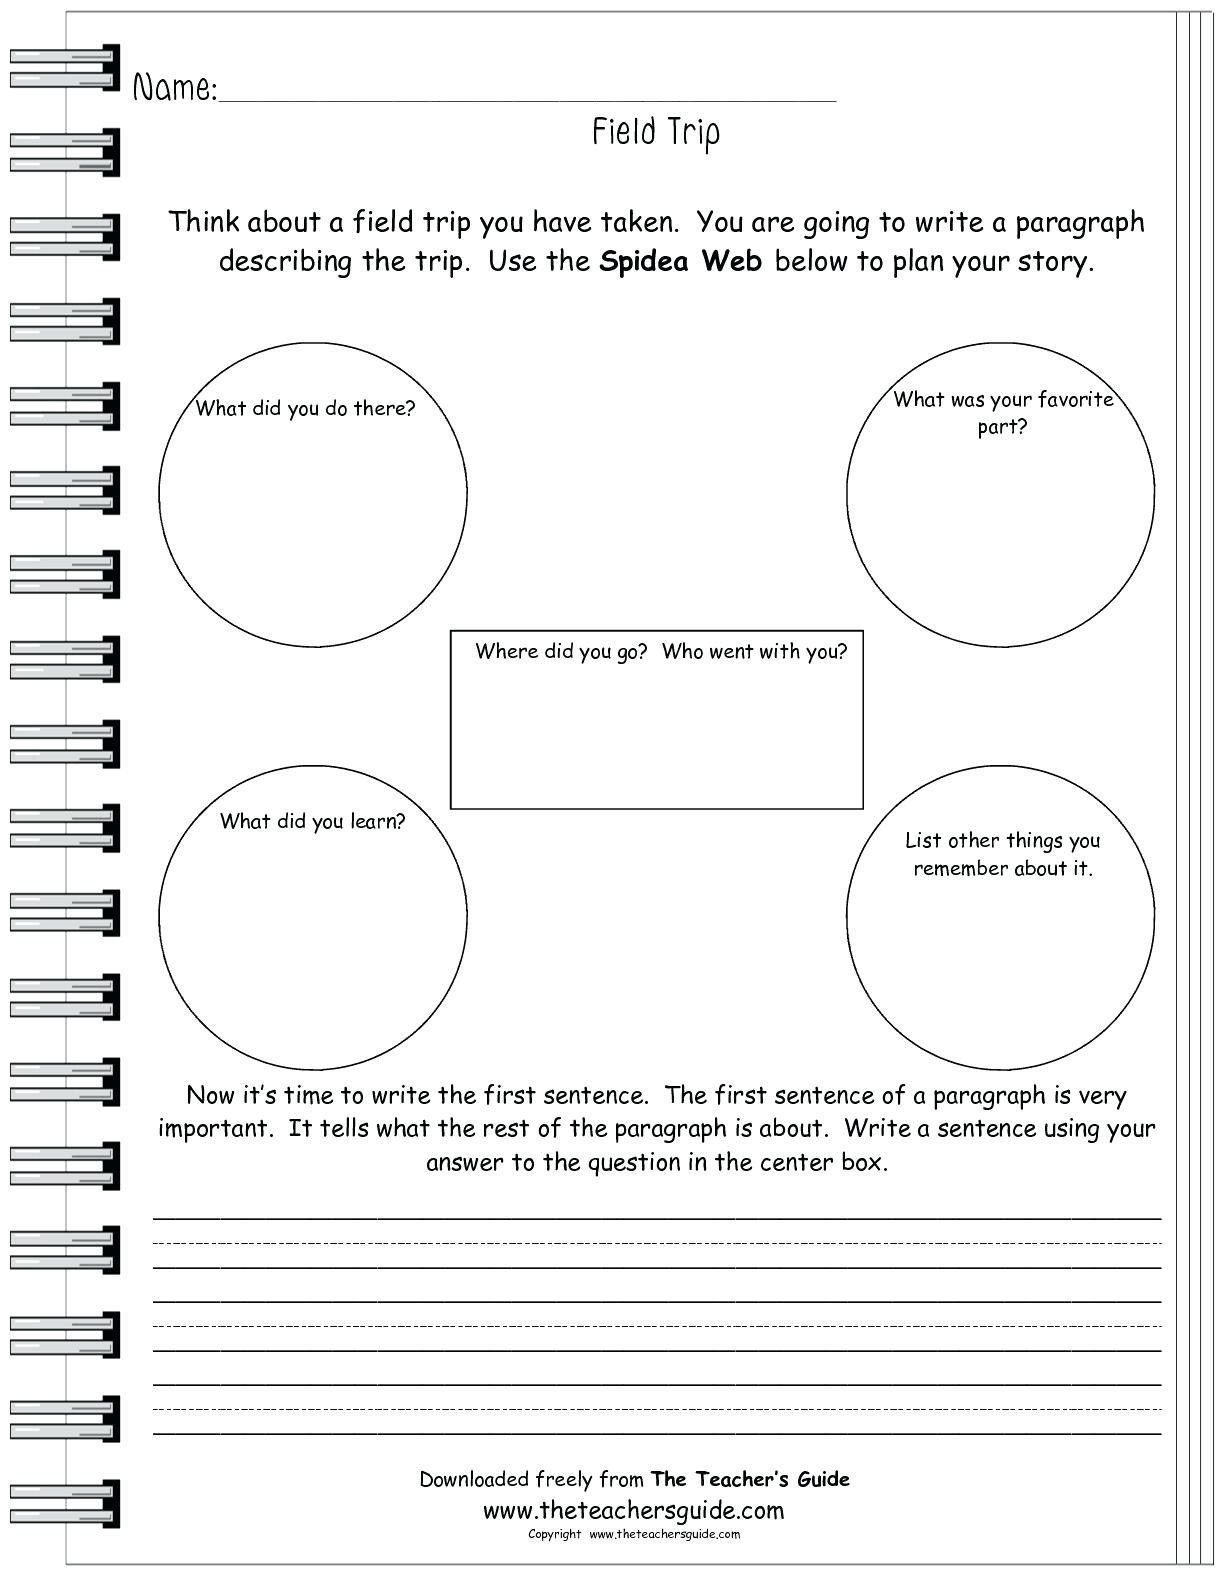 Handwriting Worksheet Generator Pics (With Images